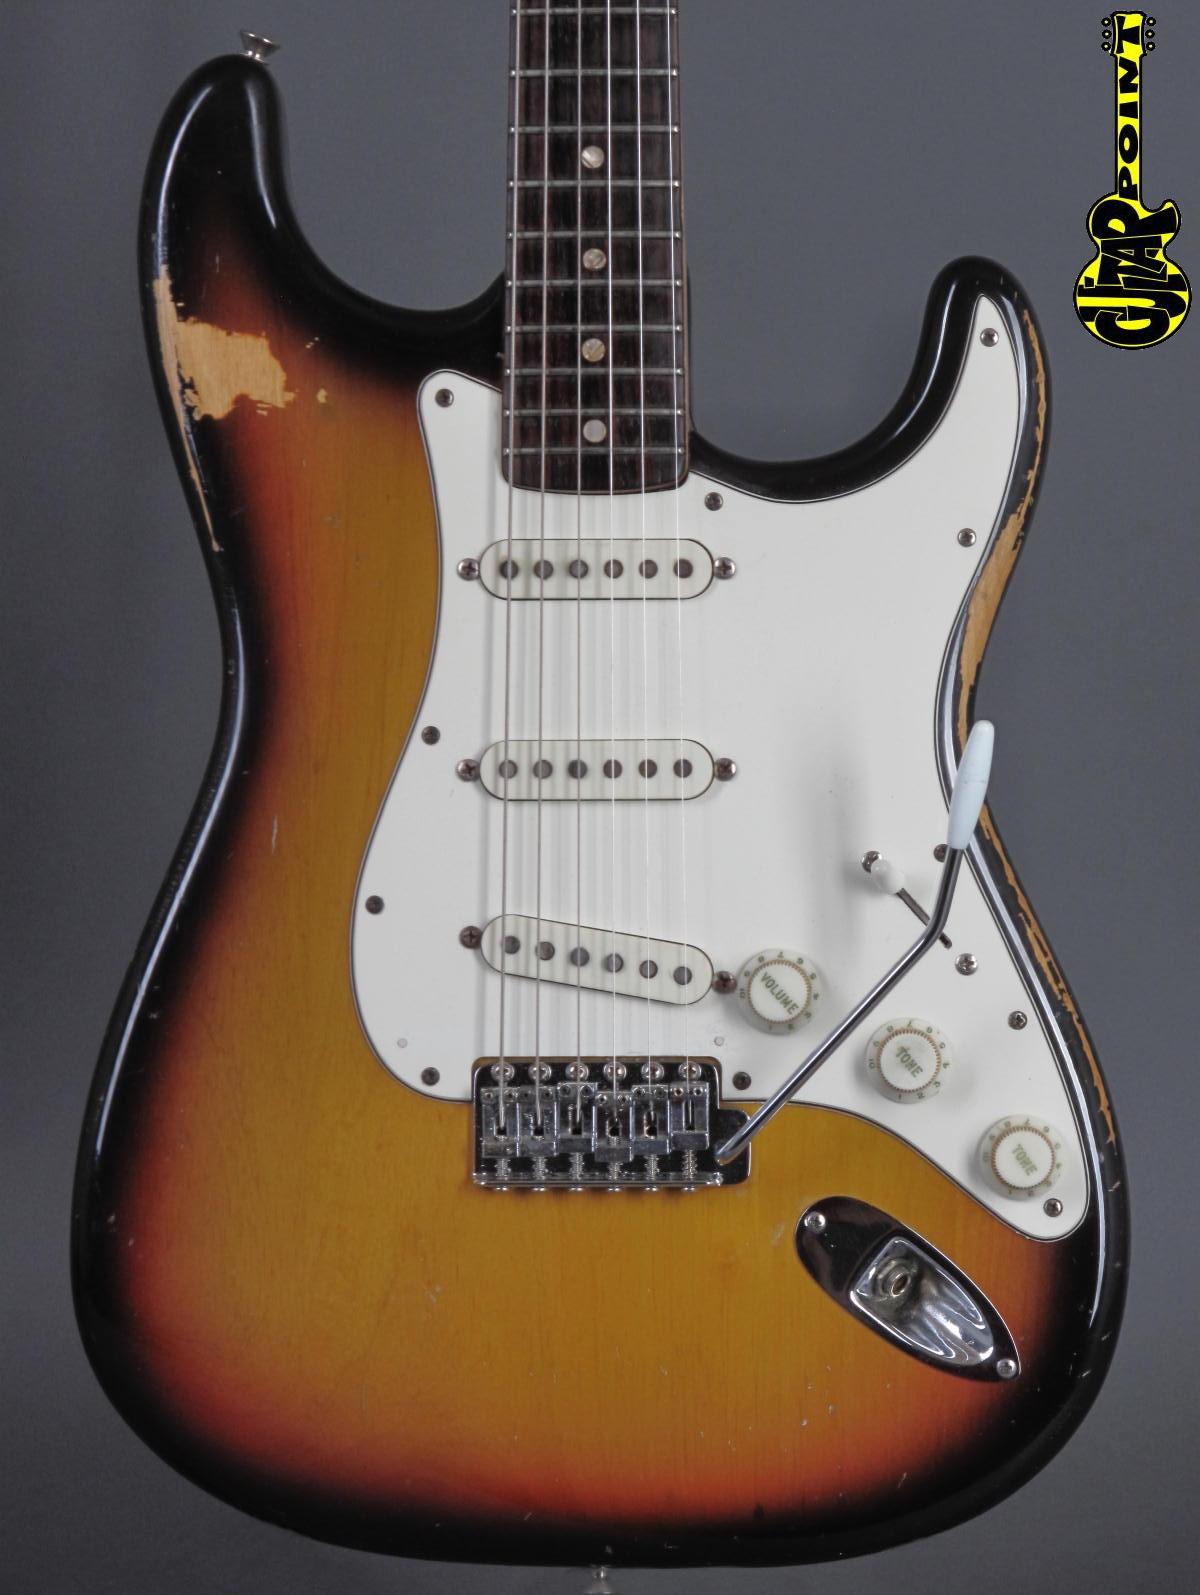 1972 Fender Stratocaster - 3-tone Sunburst  ...rare rosewood fretboard